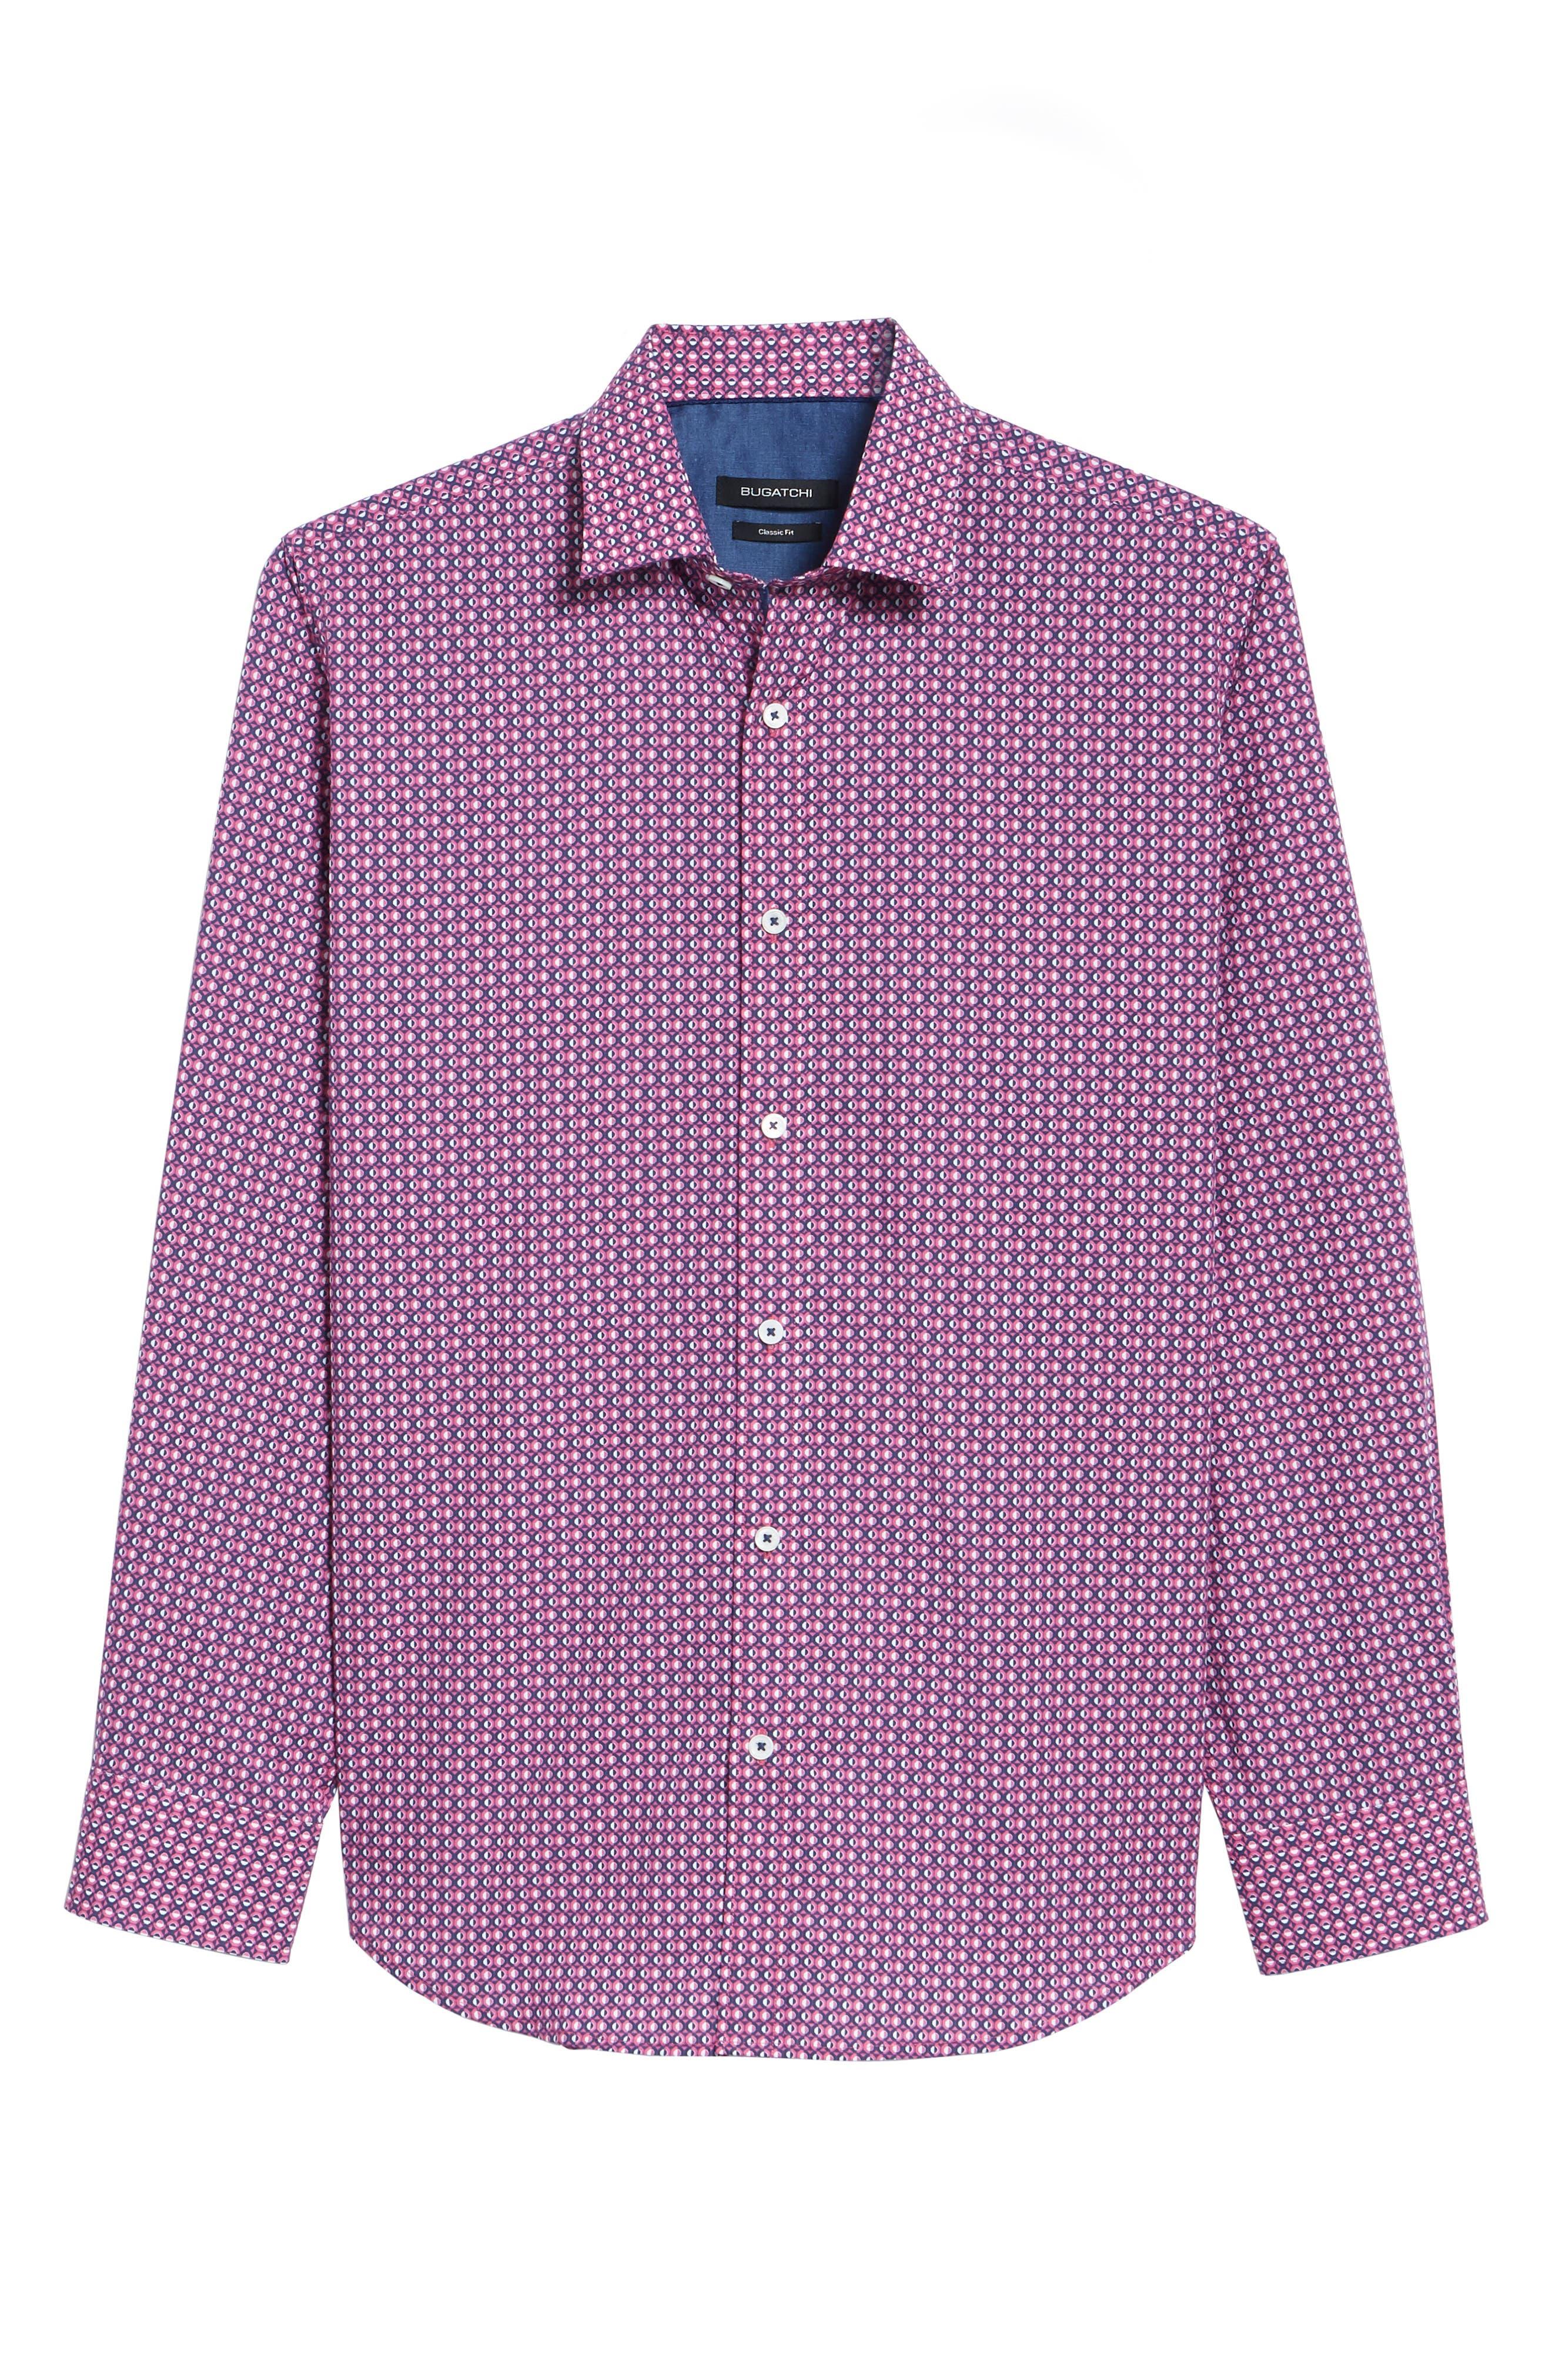 Classic Fit Woven Sport Shirt,                             Alternate thumbnail 6, color,                             678